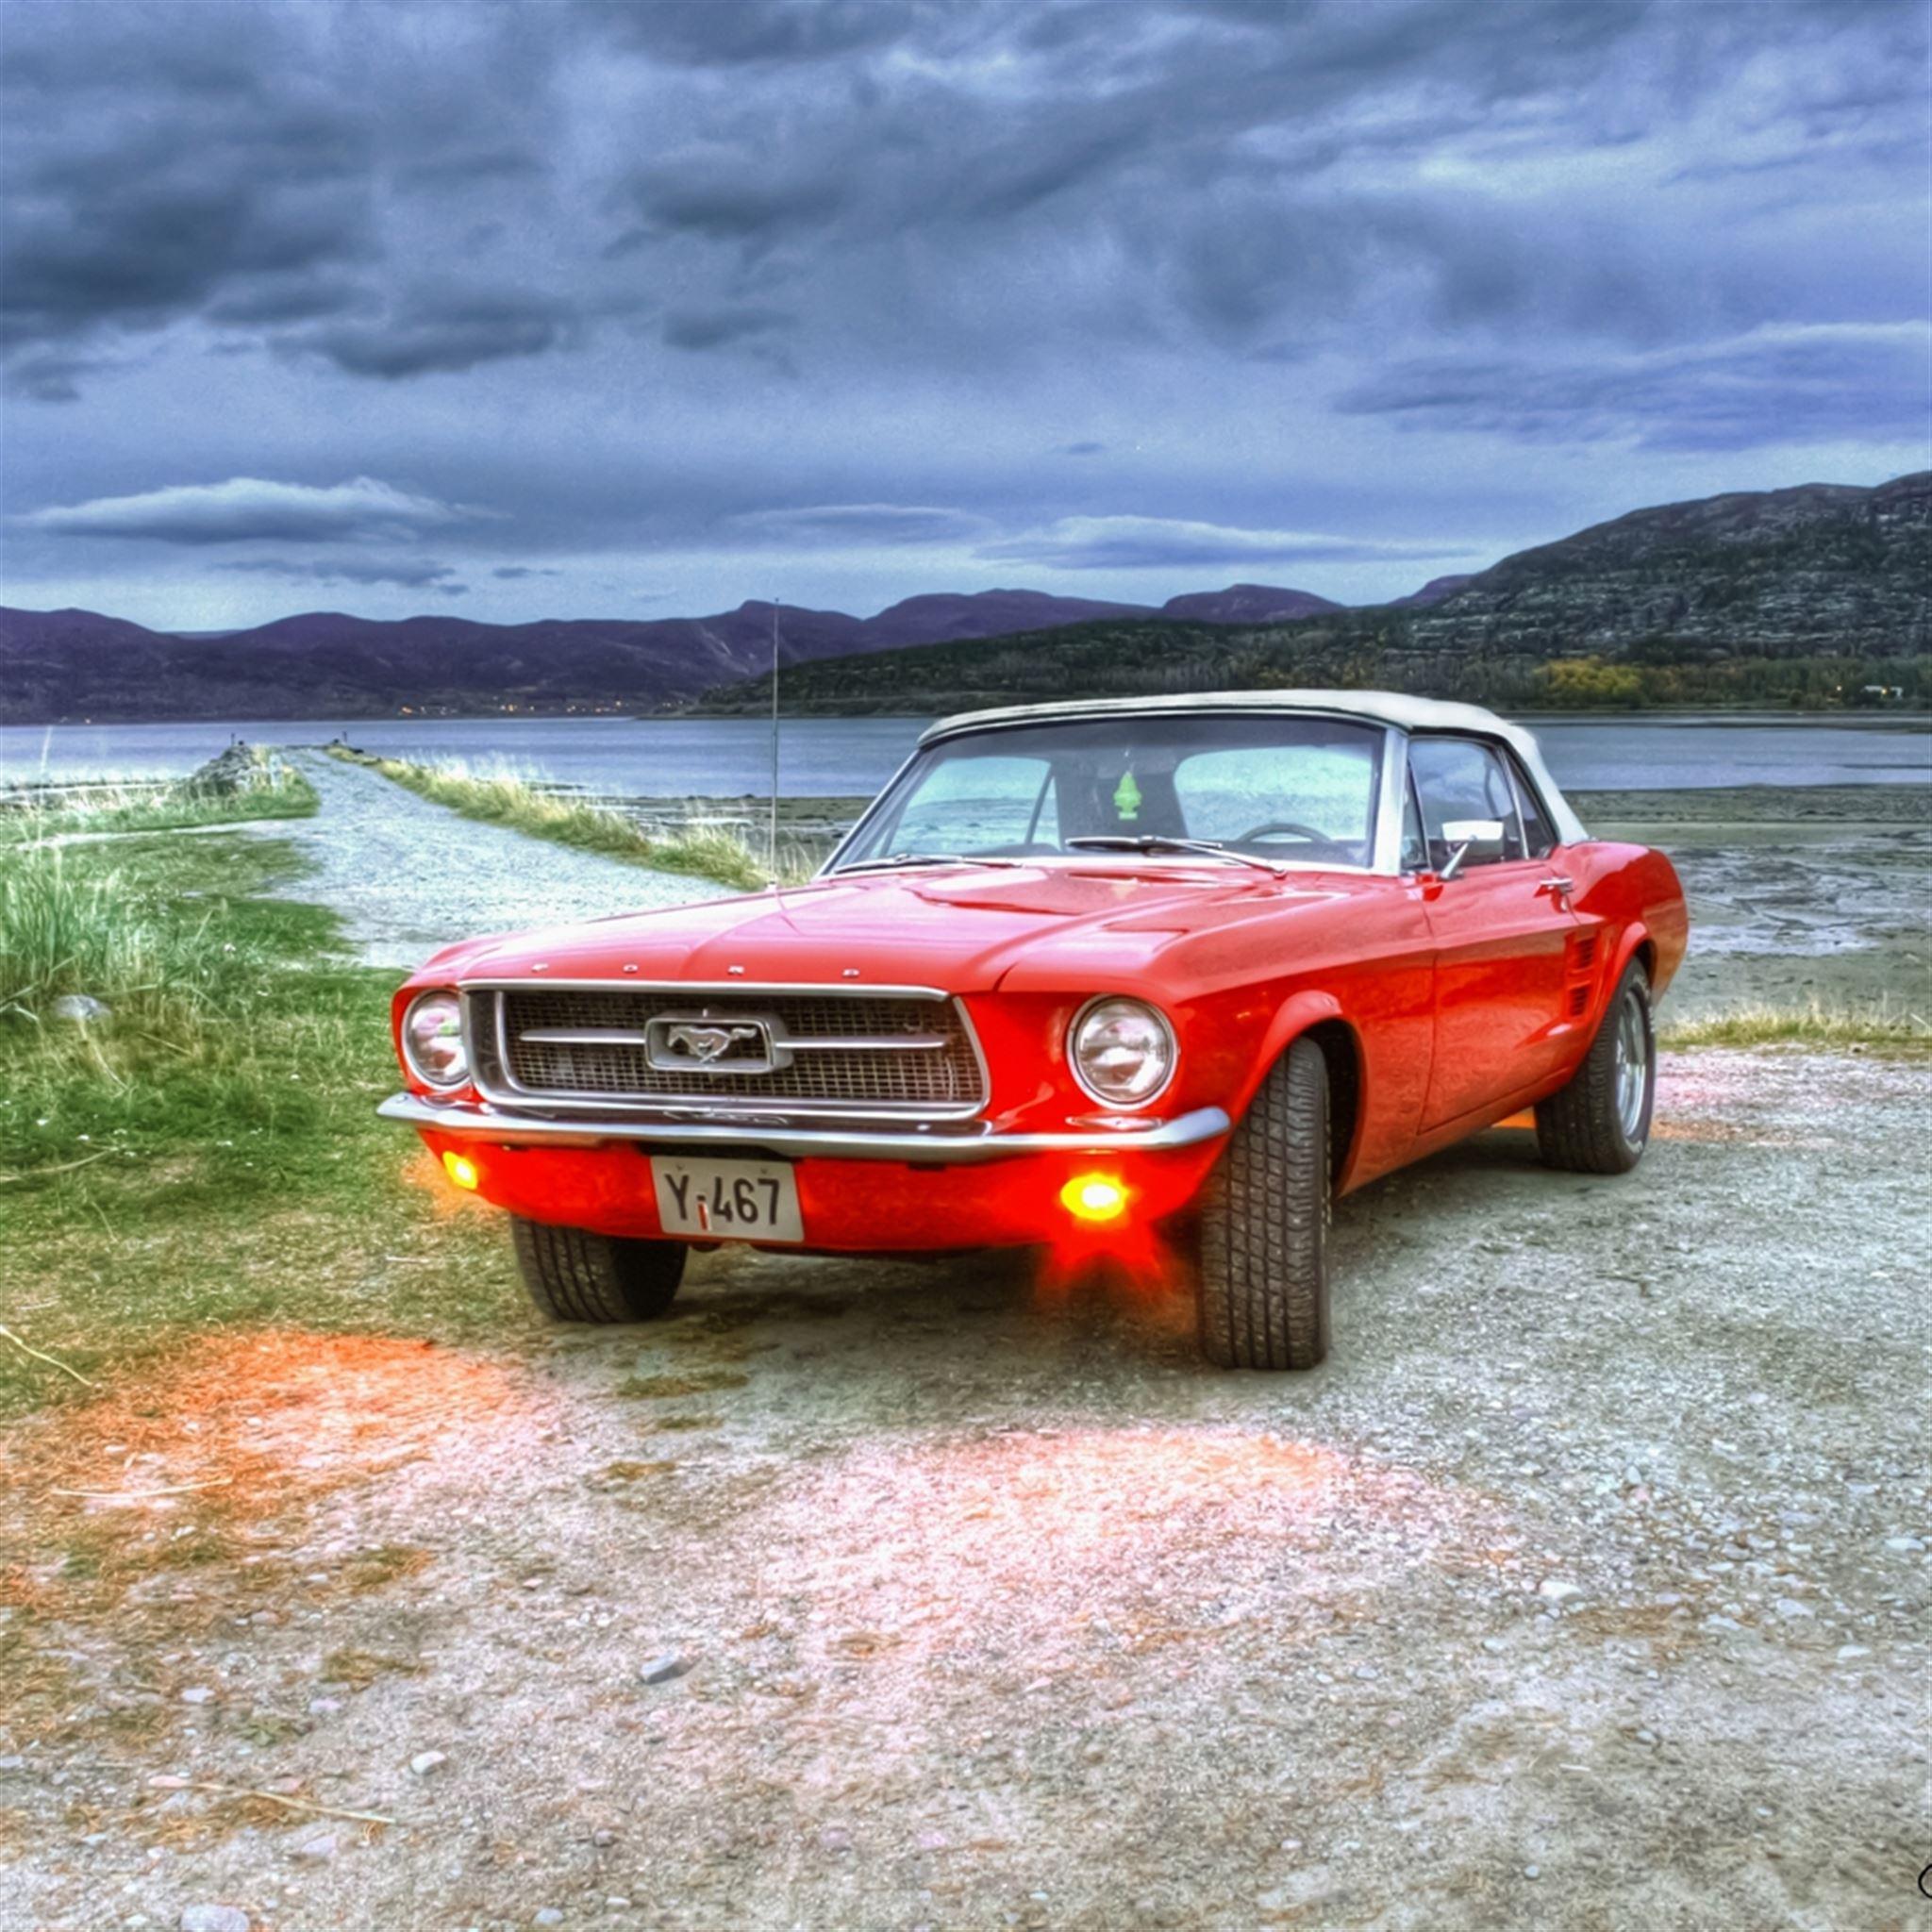 Ford Mustang Wild Landscape iPad wallpaper